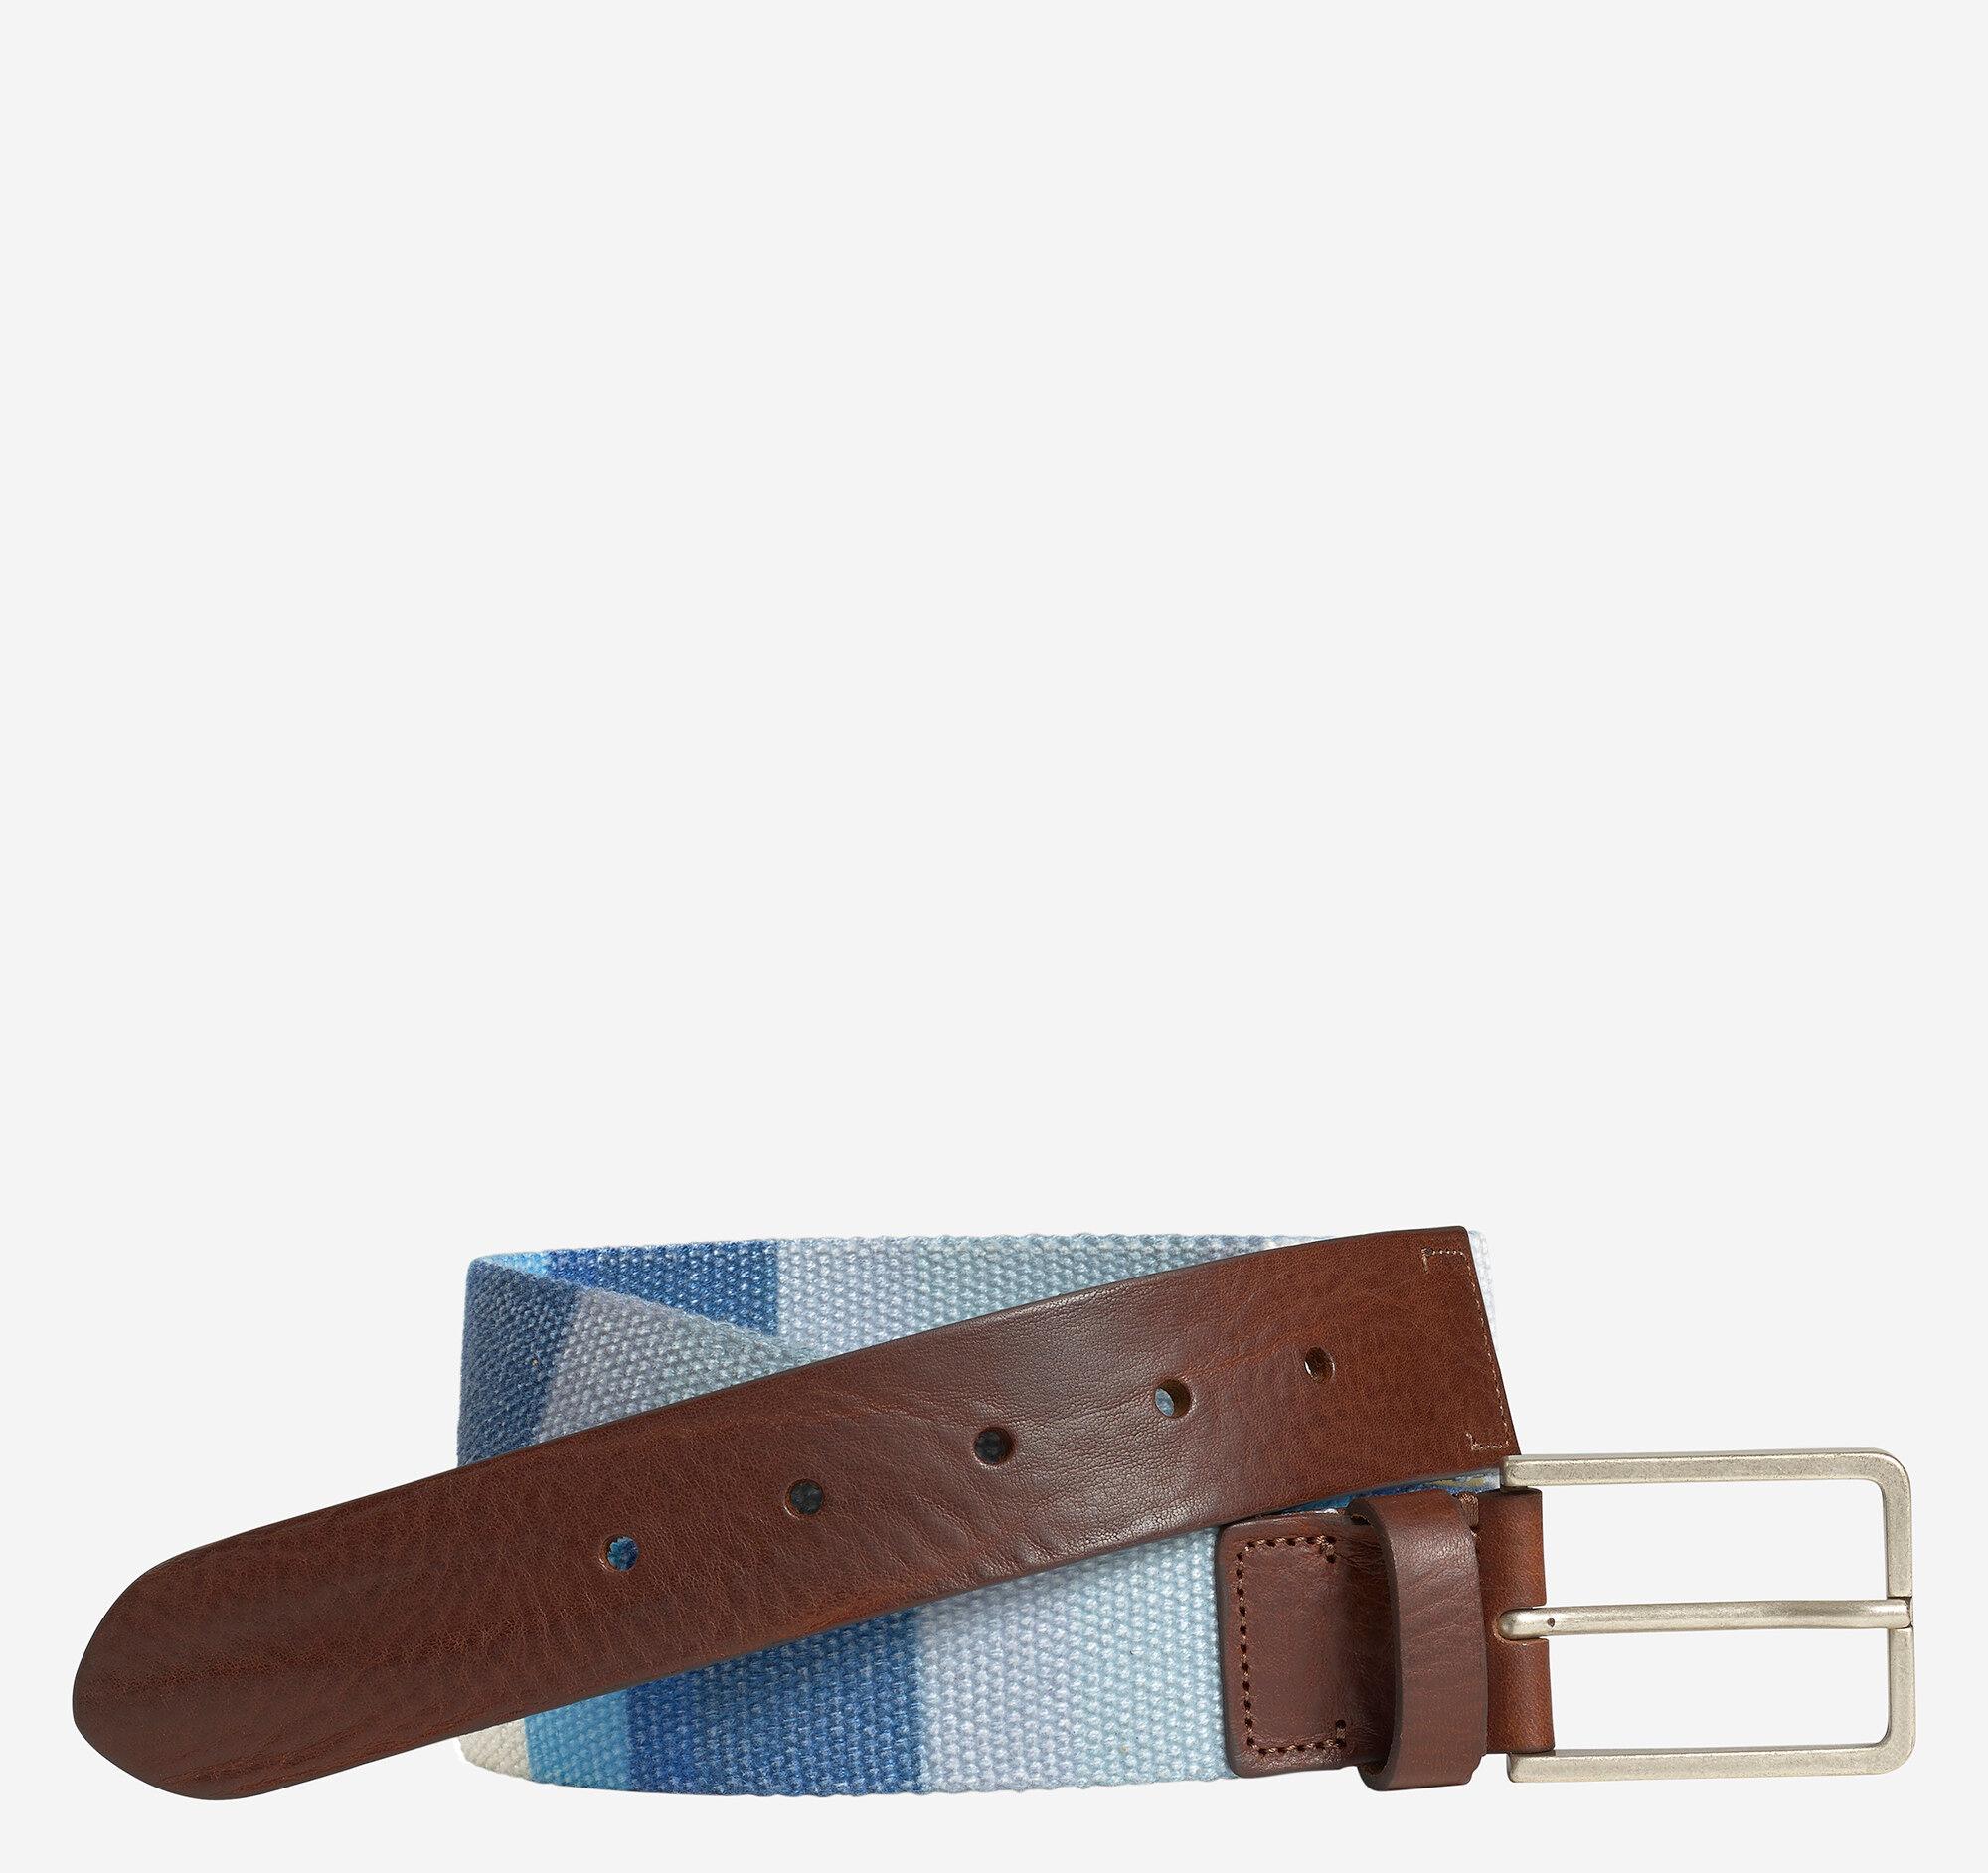 Johnston & Murphy Men's Multi-Color Cloth Belt - Blue Multi Cloth - Size 32